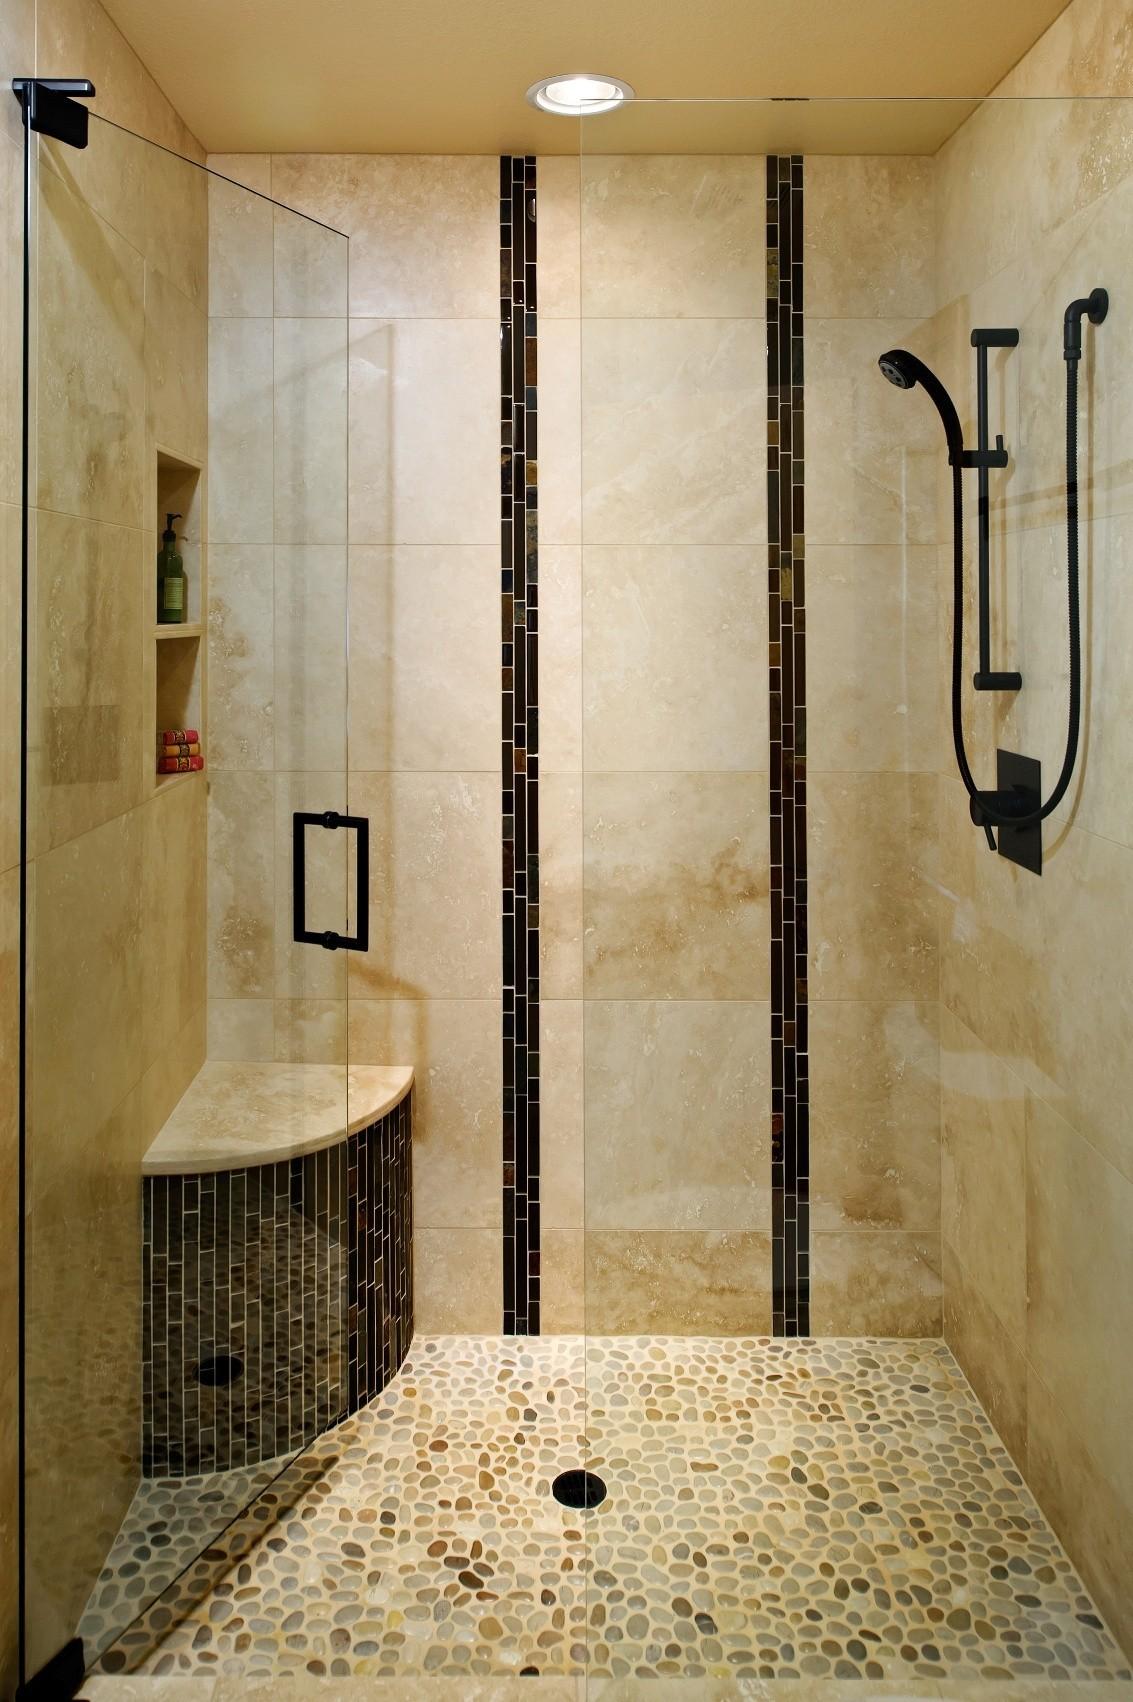 Modern Bathroom Tiles Design Ideas for Small Bathrooms ...